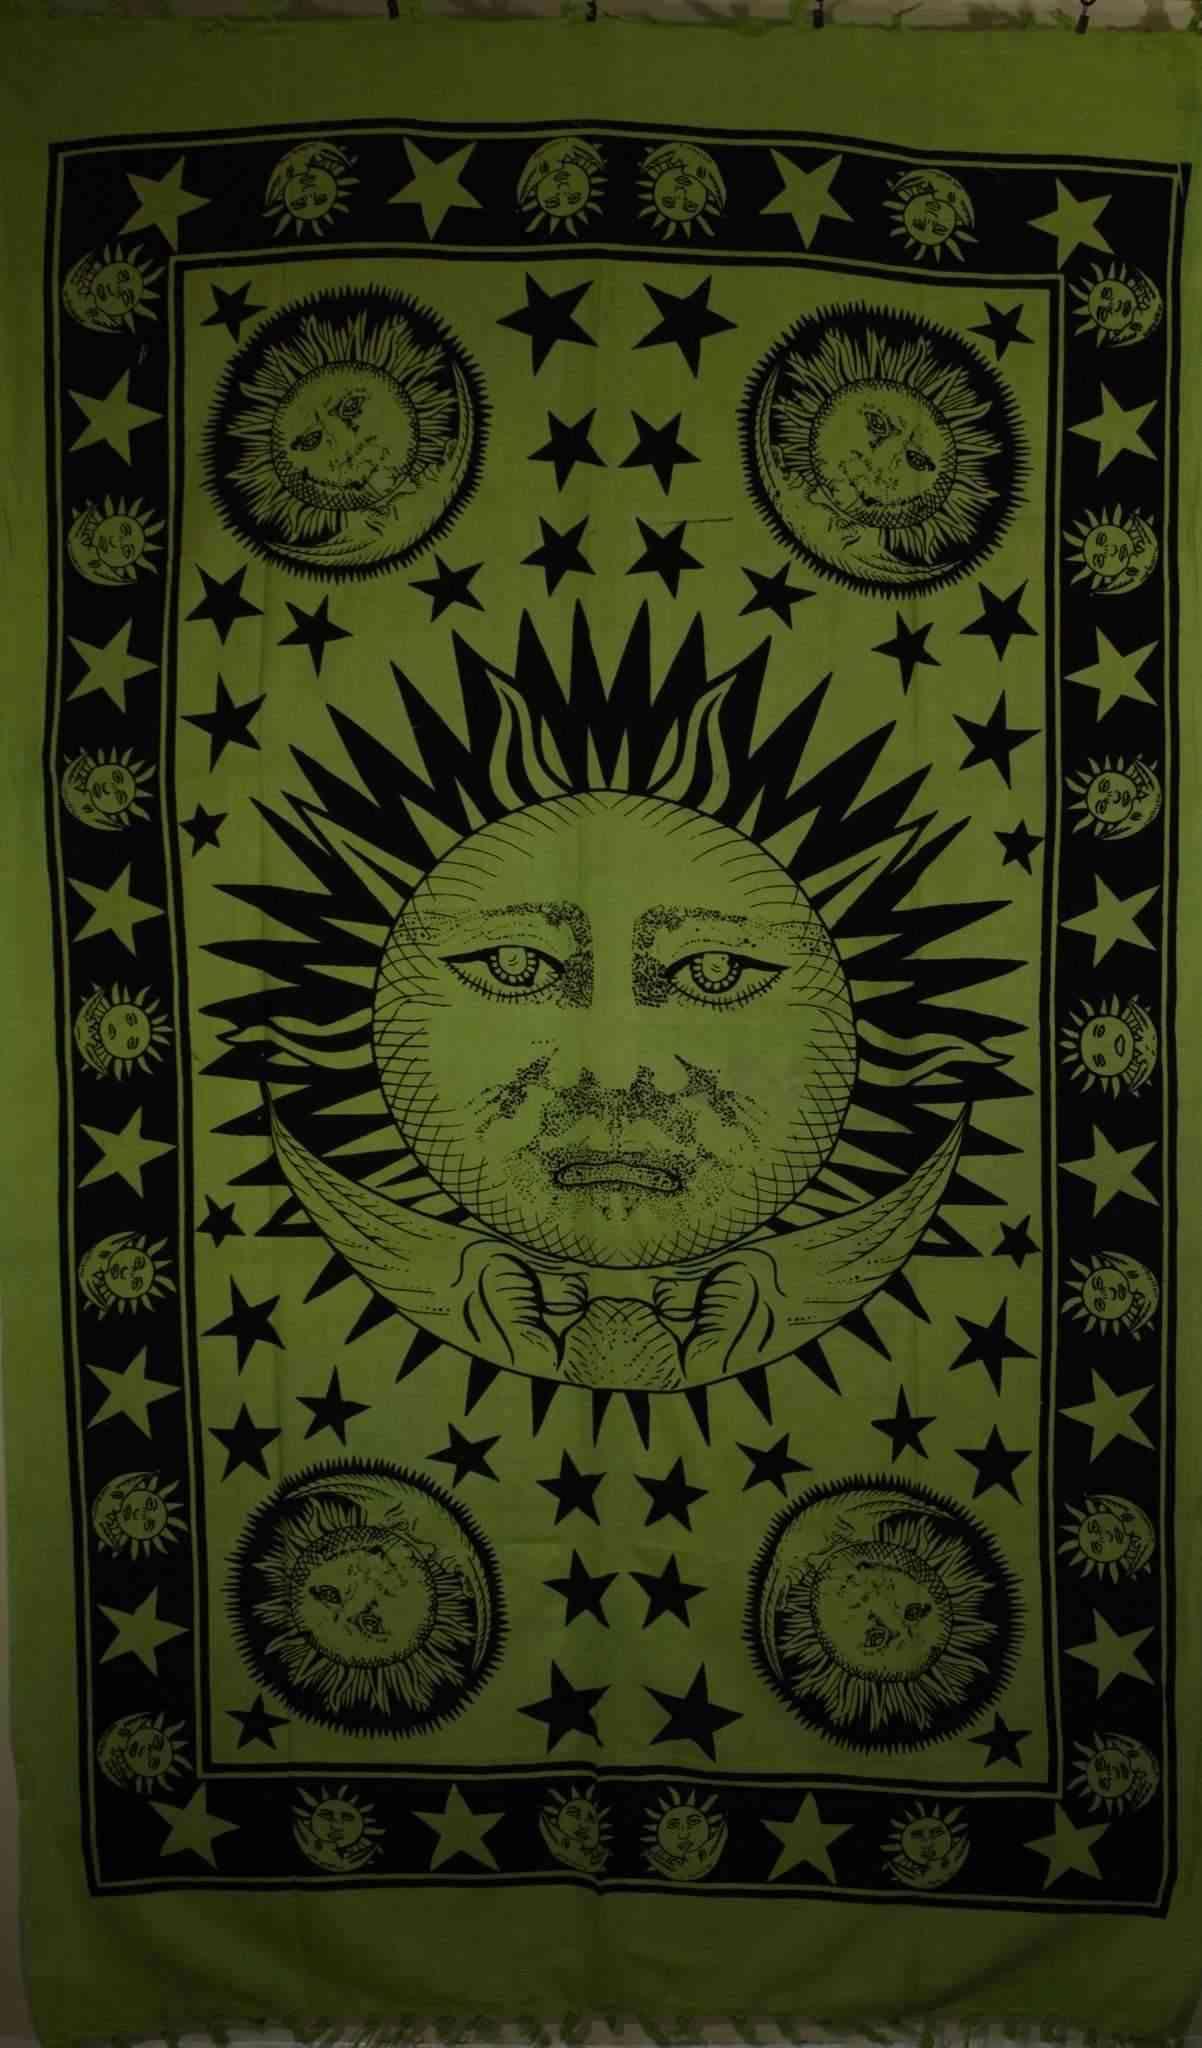 Celestial Style Sun Moon & Stars Tapestry